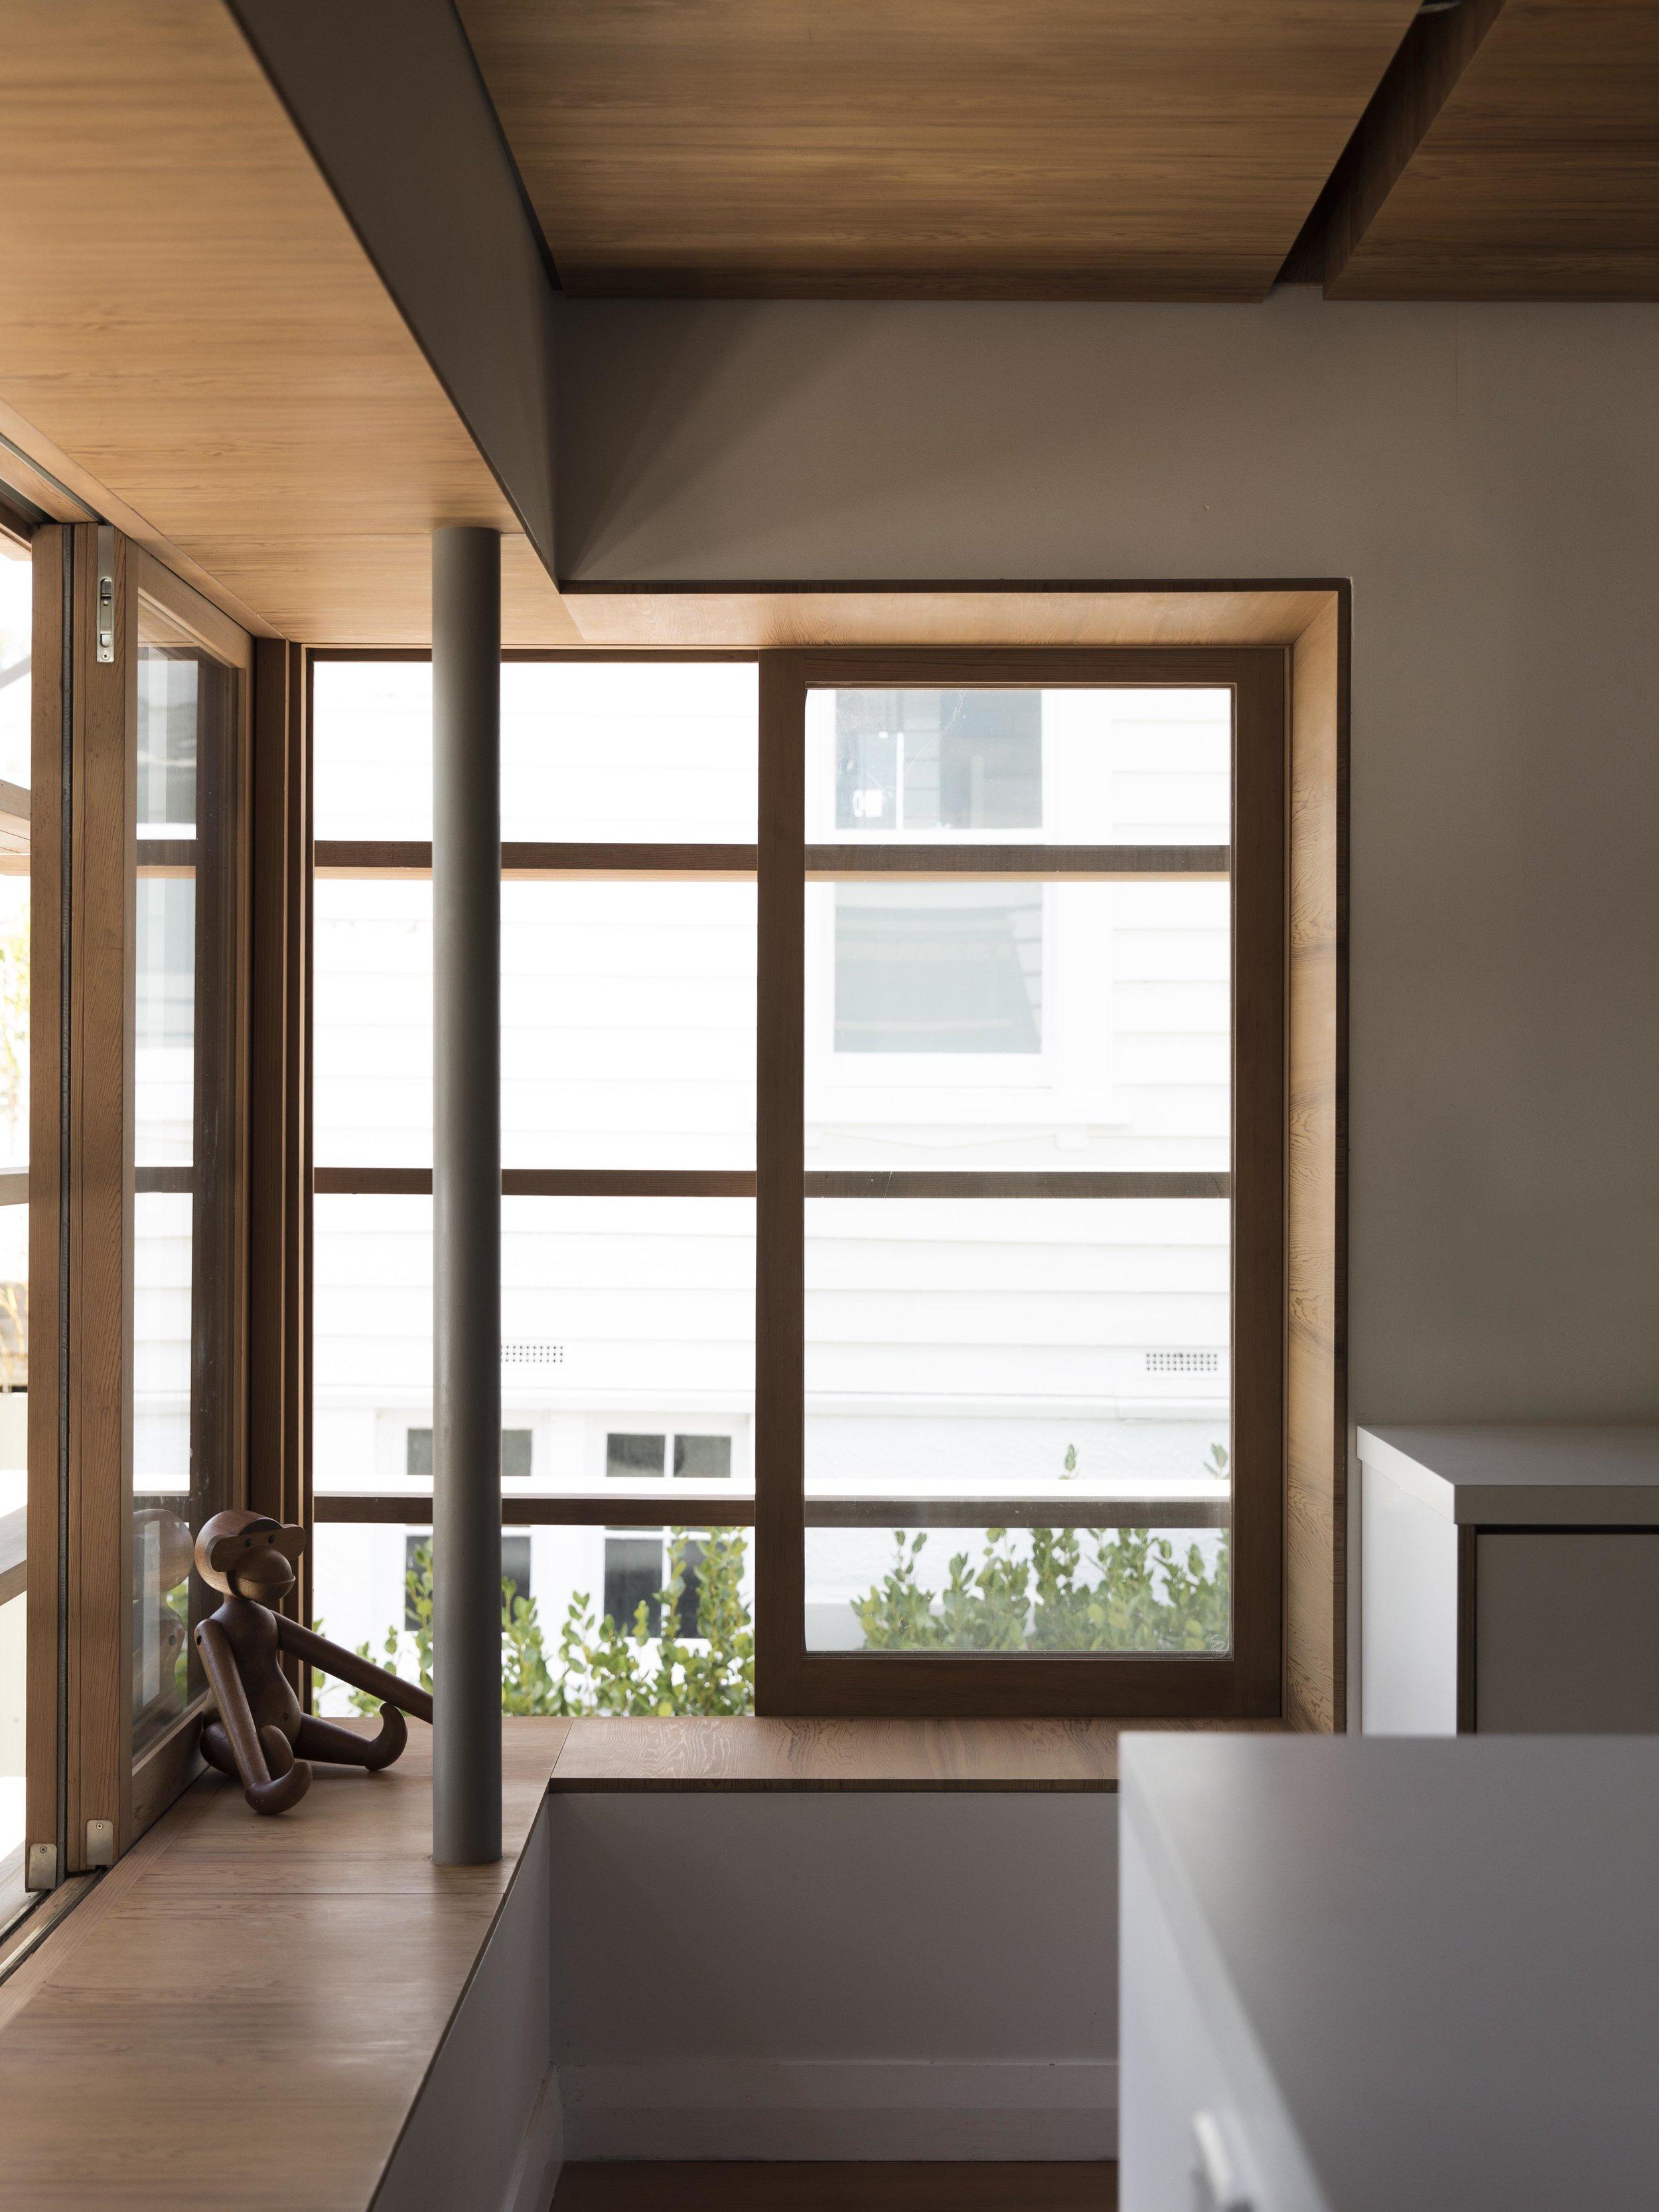 Christopber-Beer-Architect-Designer-Object-Space-Auckland-02.jpg